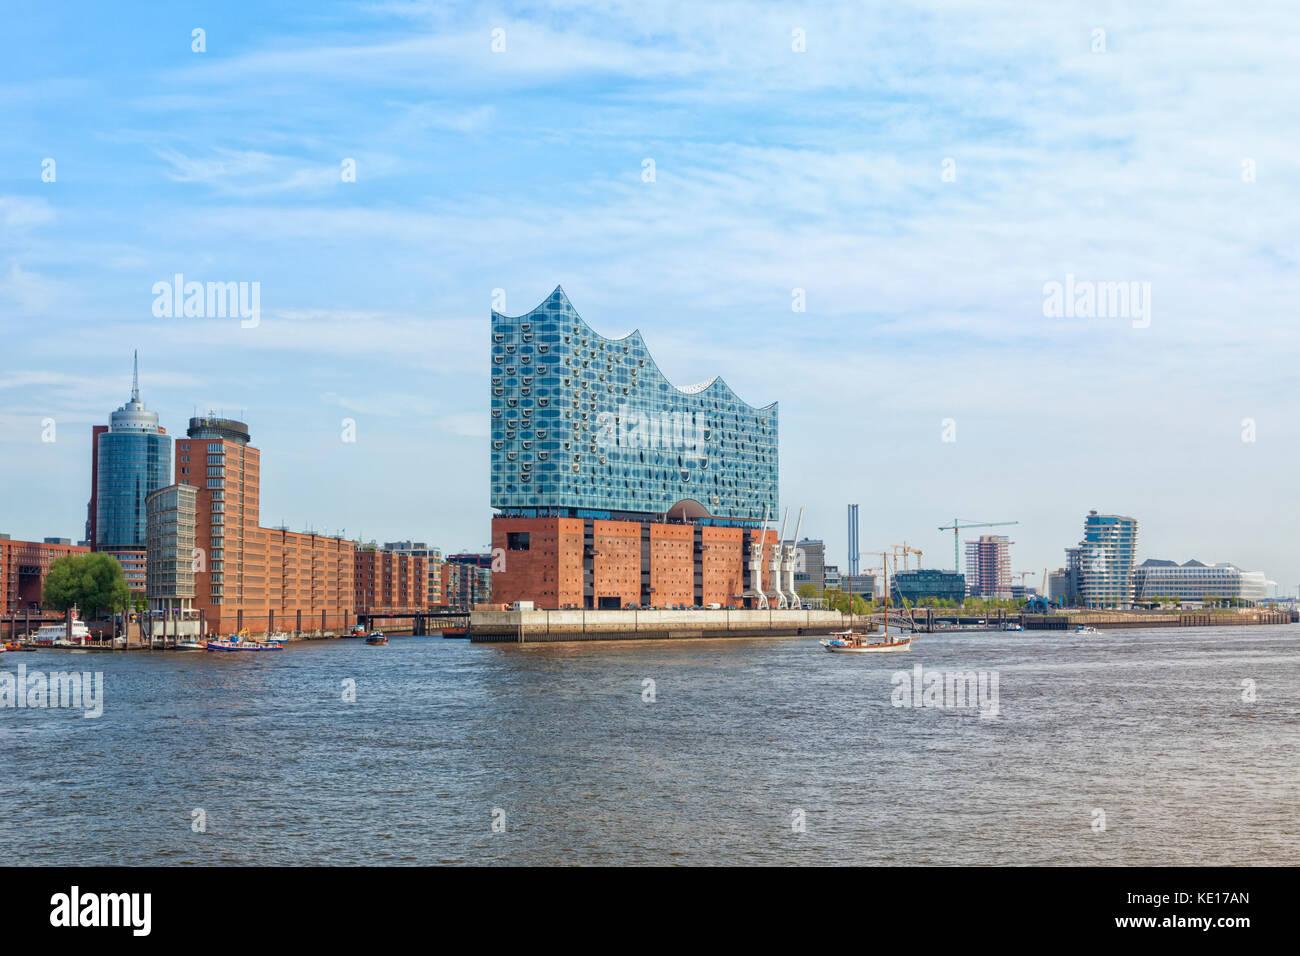 Hafen City quarter of Hamburg with the Elbe Philharmonic Hall or Elbphilharmonie building Stock Photo